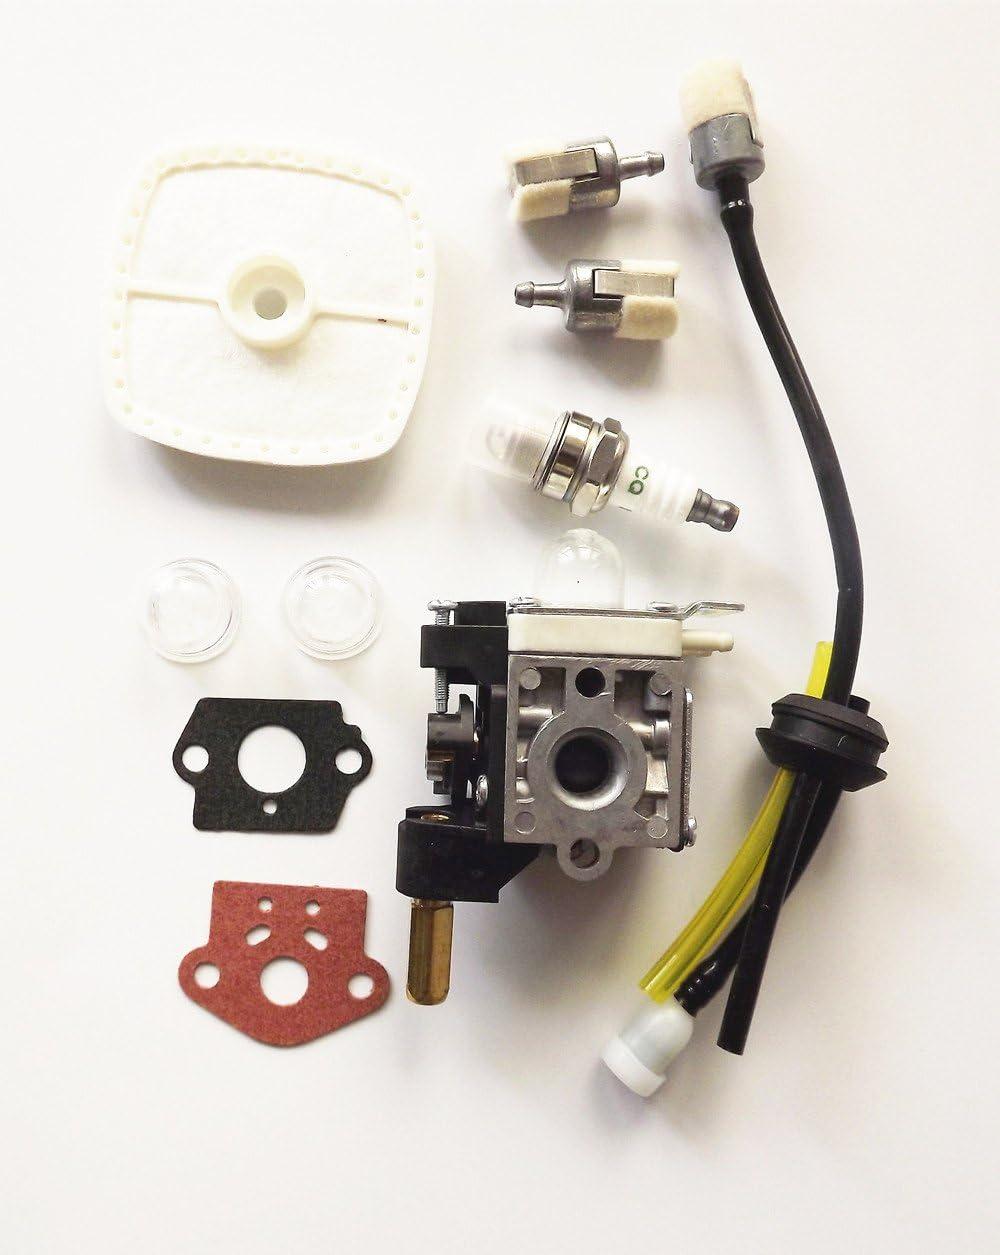 Carburetor Rebuild Kit for ZAMA RB-K75 Echo SRM 210 SRM 211 HC 150 PE 200 GT 200